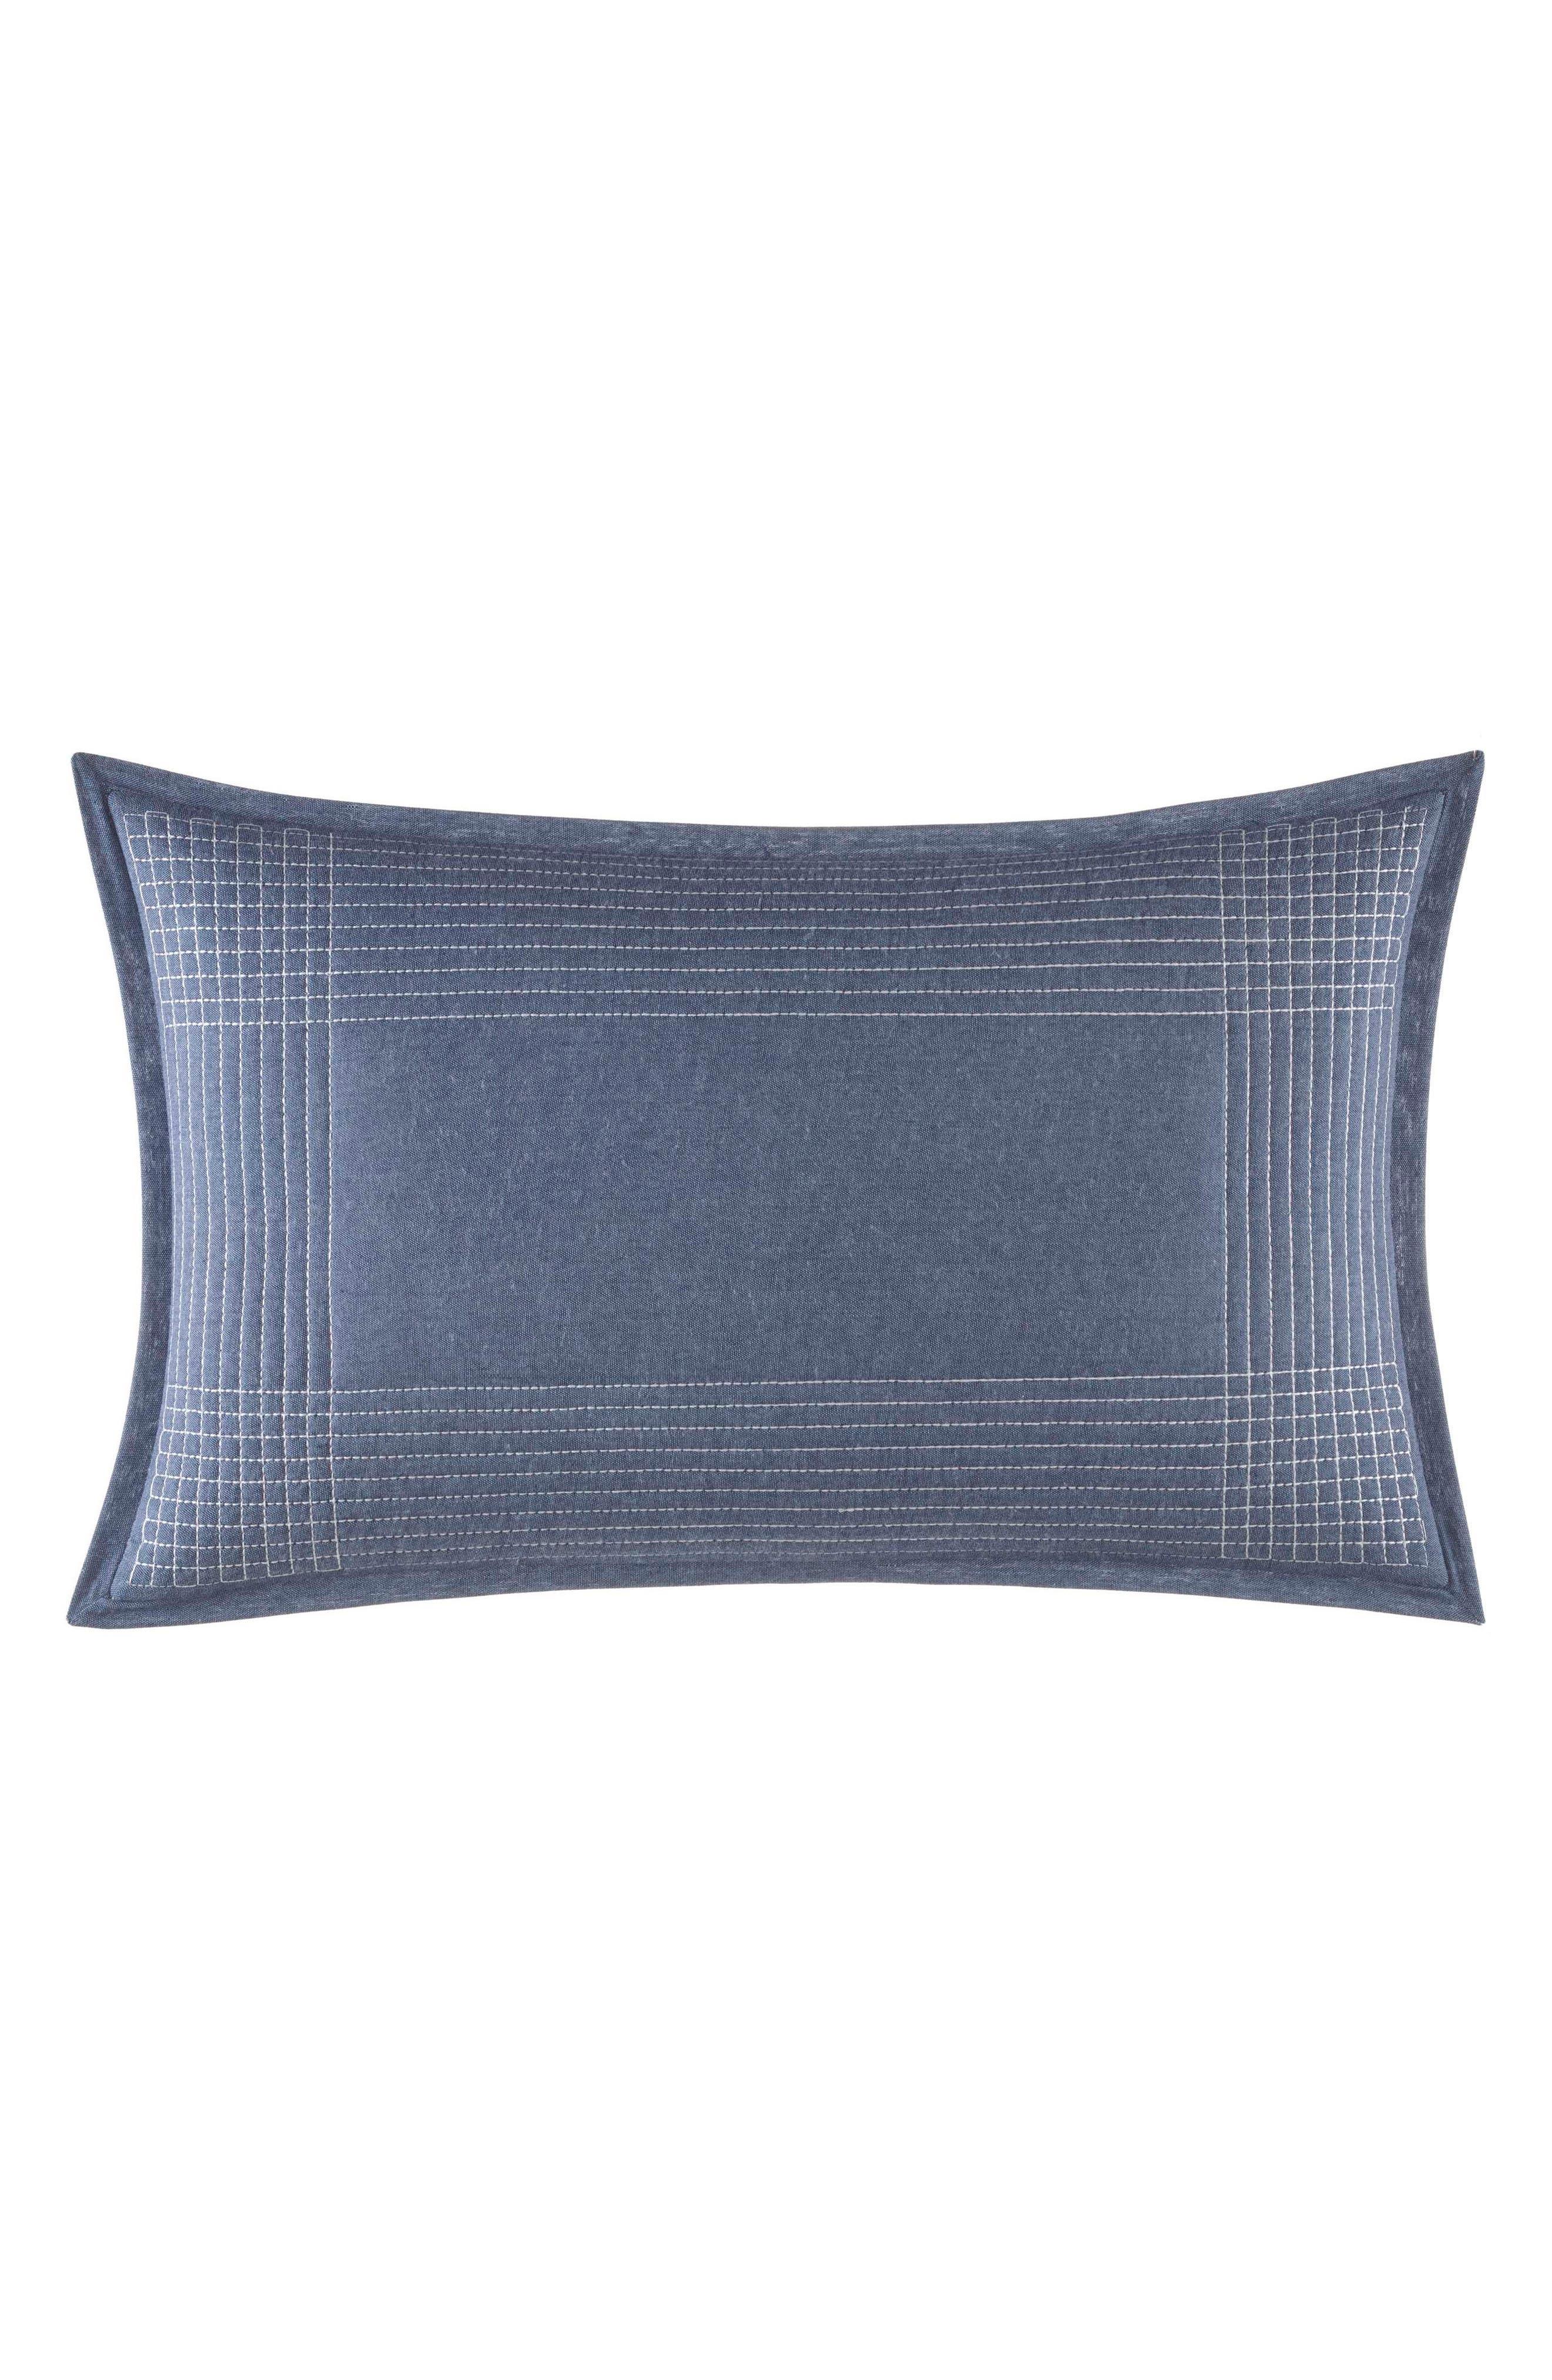 Main Image - Nautica Norwich Stitched Accent Pillow